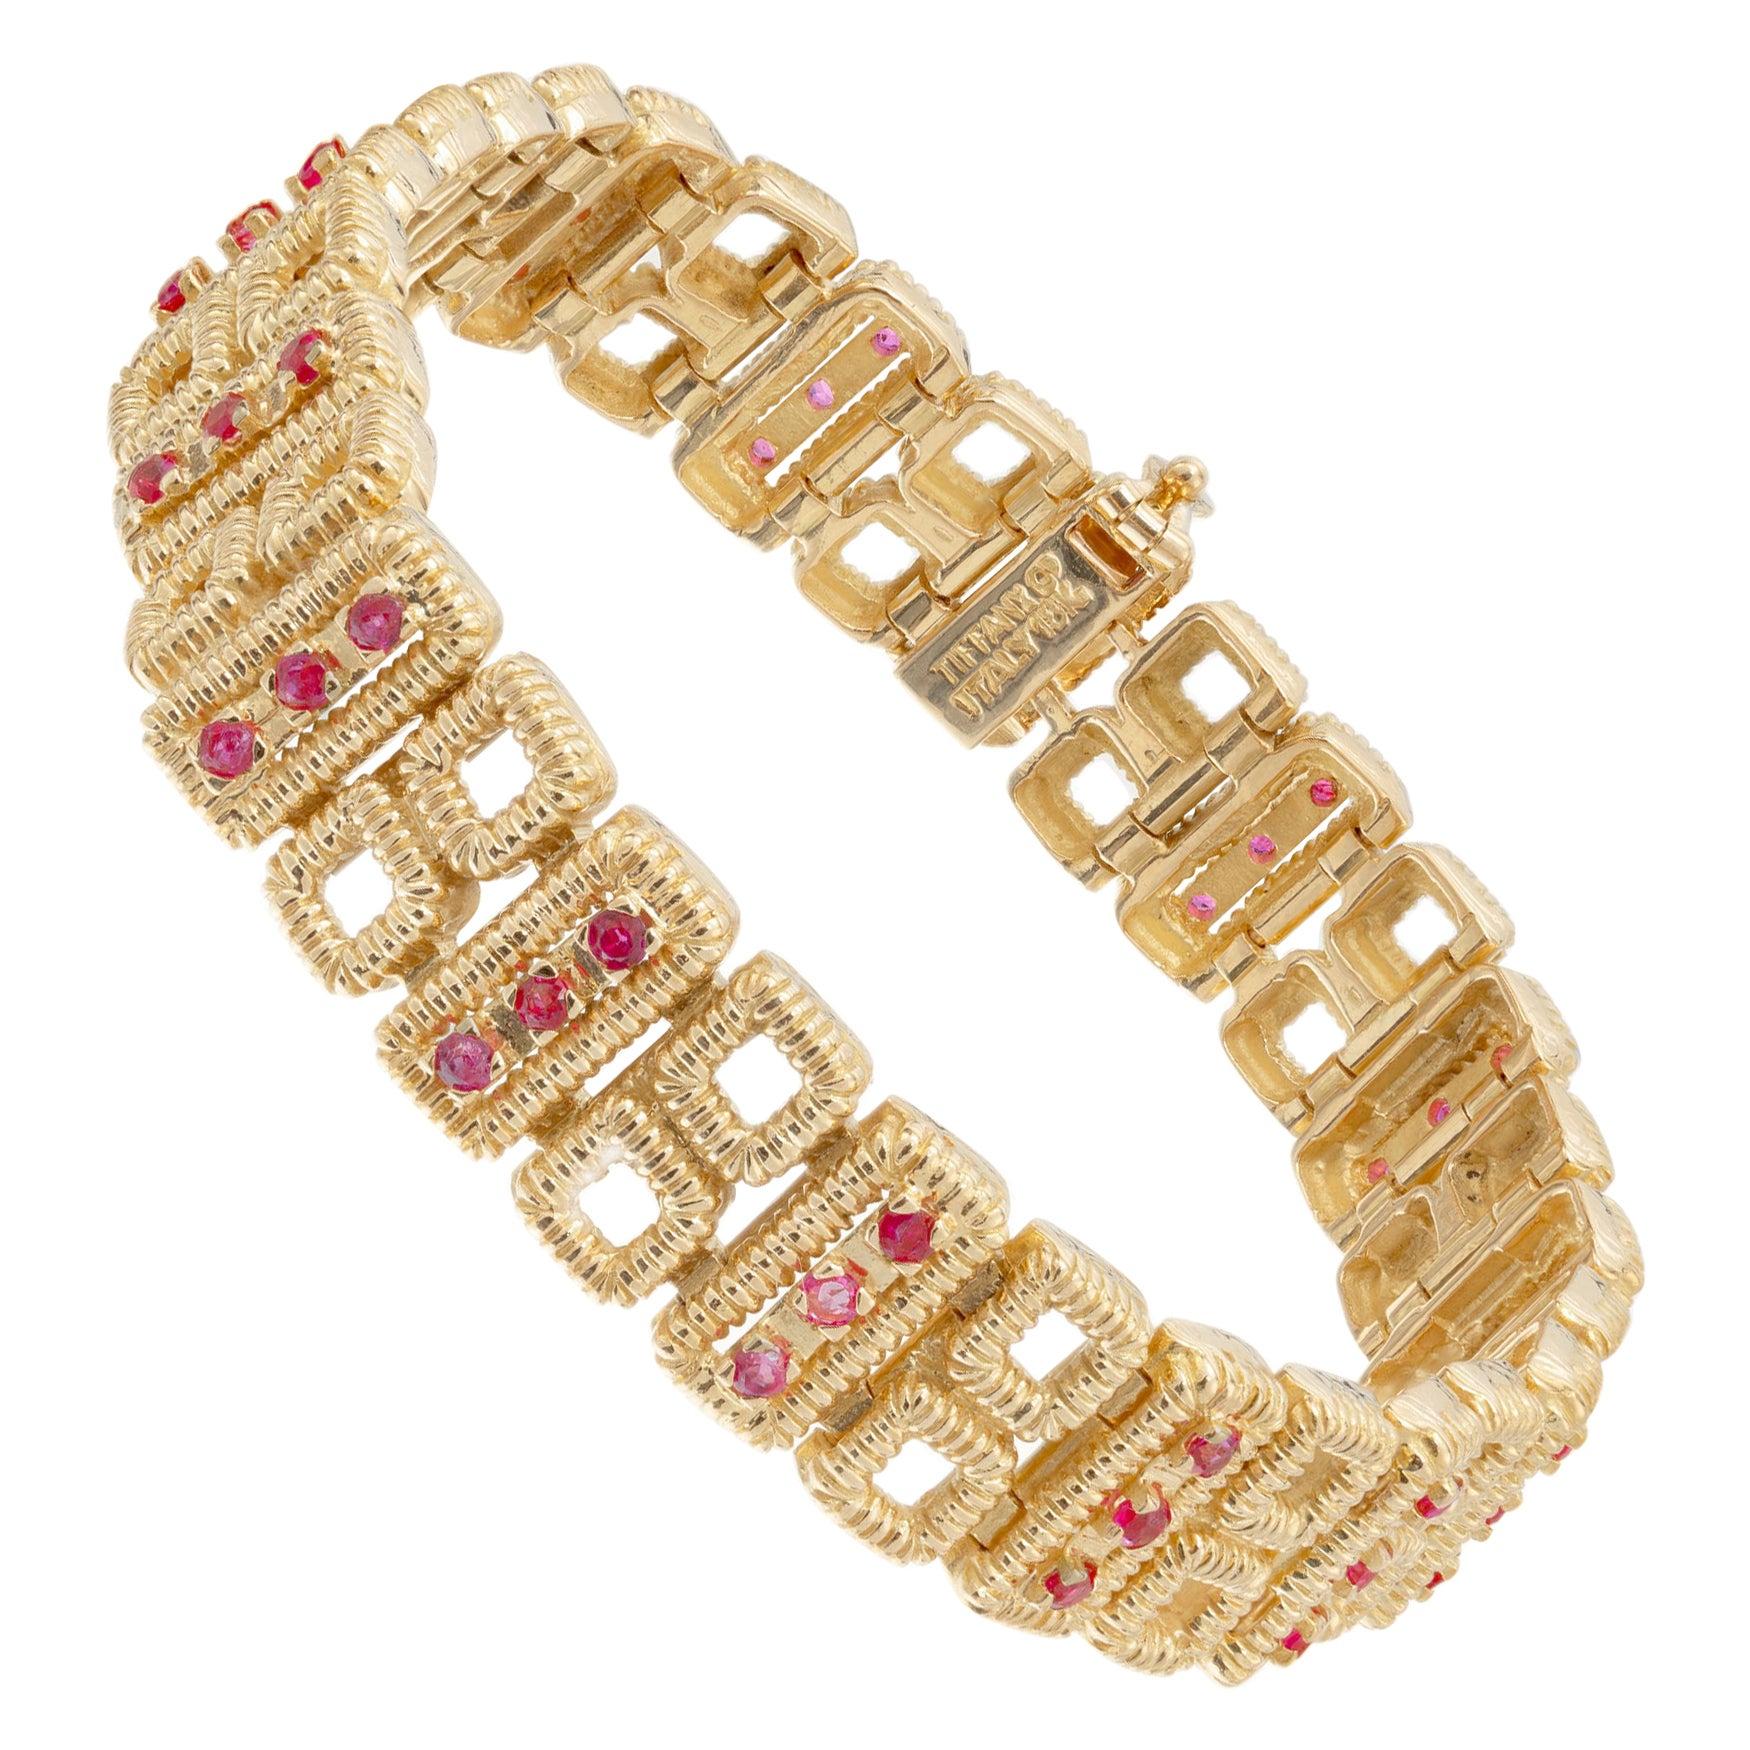 Tiffany & Co. 1.60 Carat Ruby Yellow Gold Link Bracelet